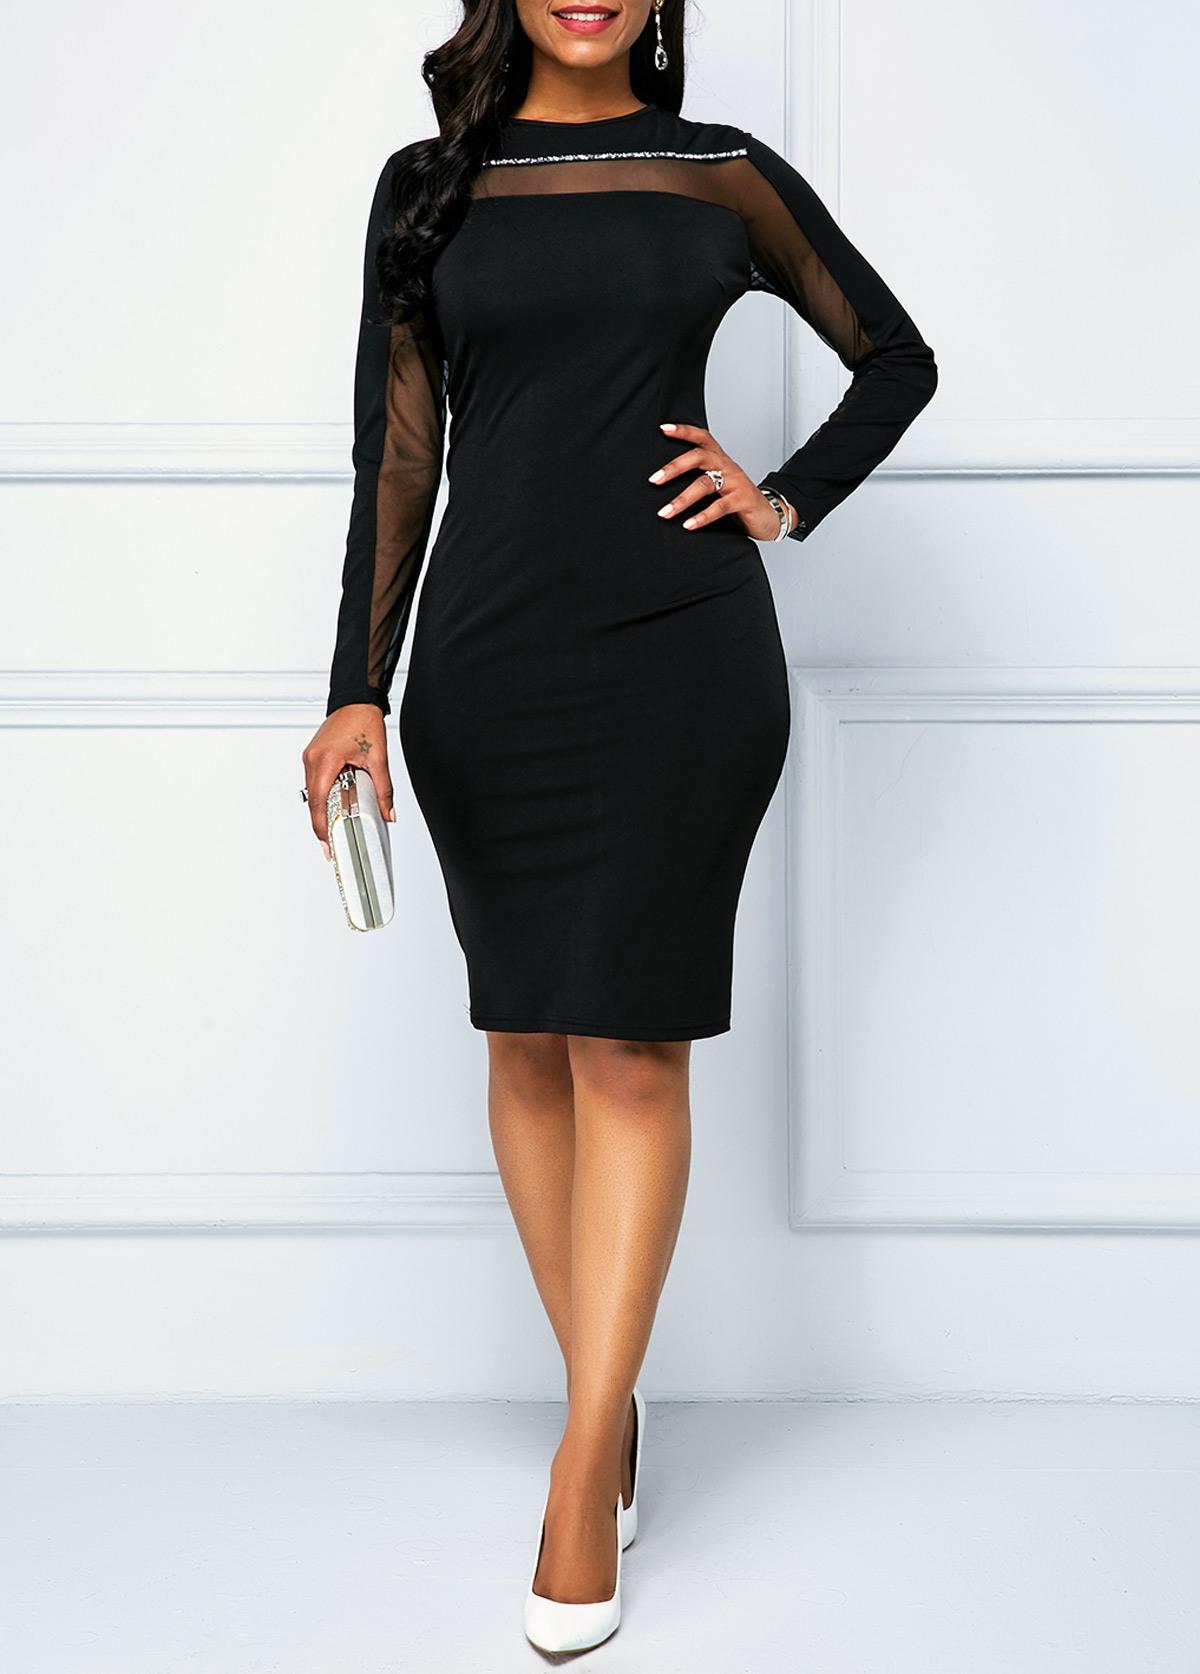 Black Long Sleeve Zipper Back Sheath Dress